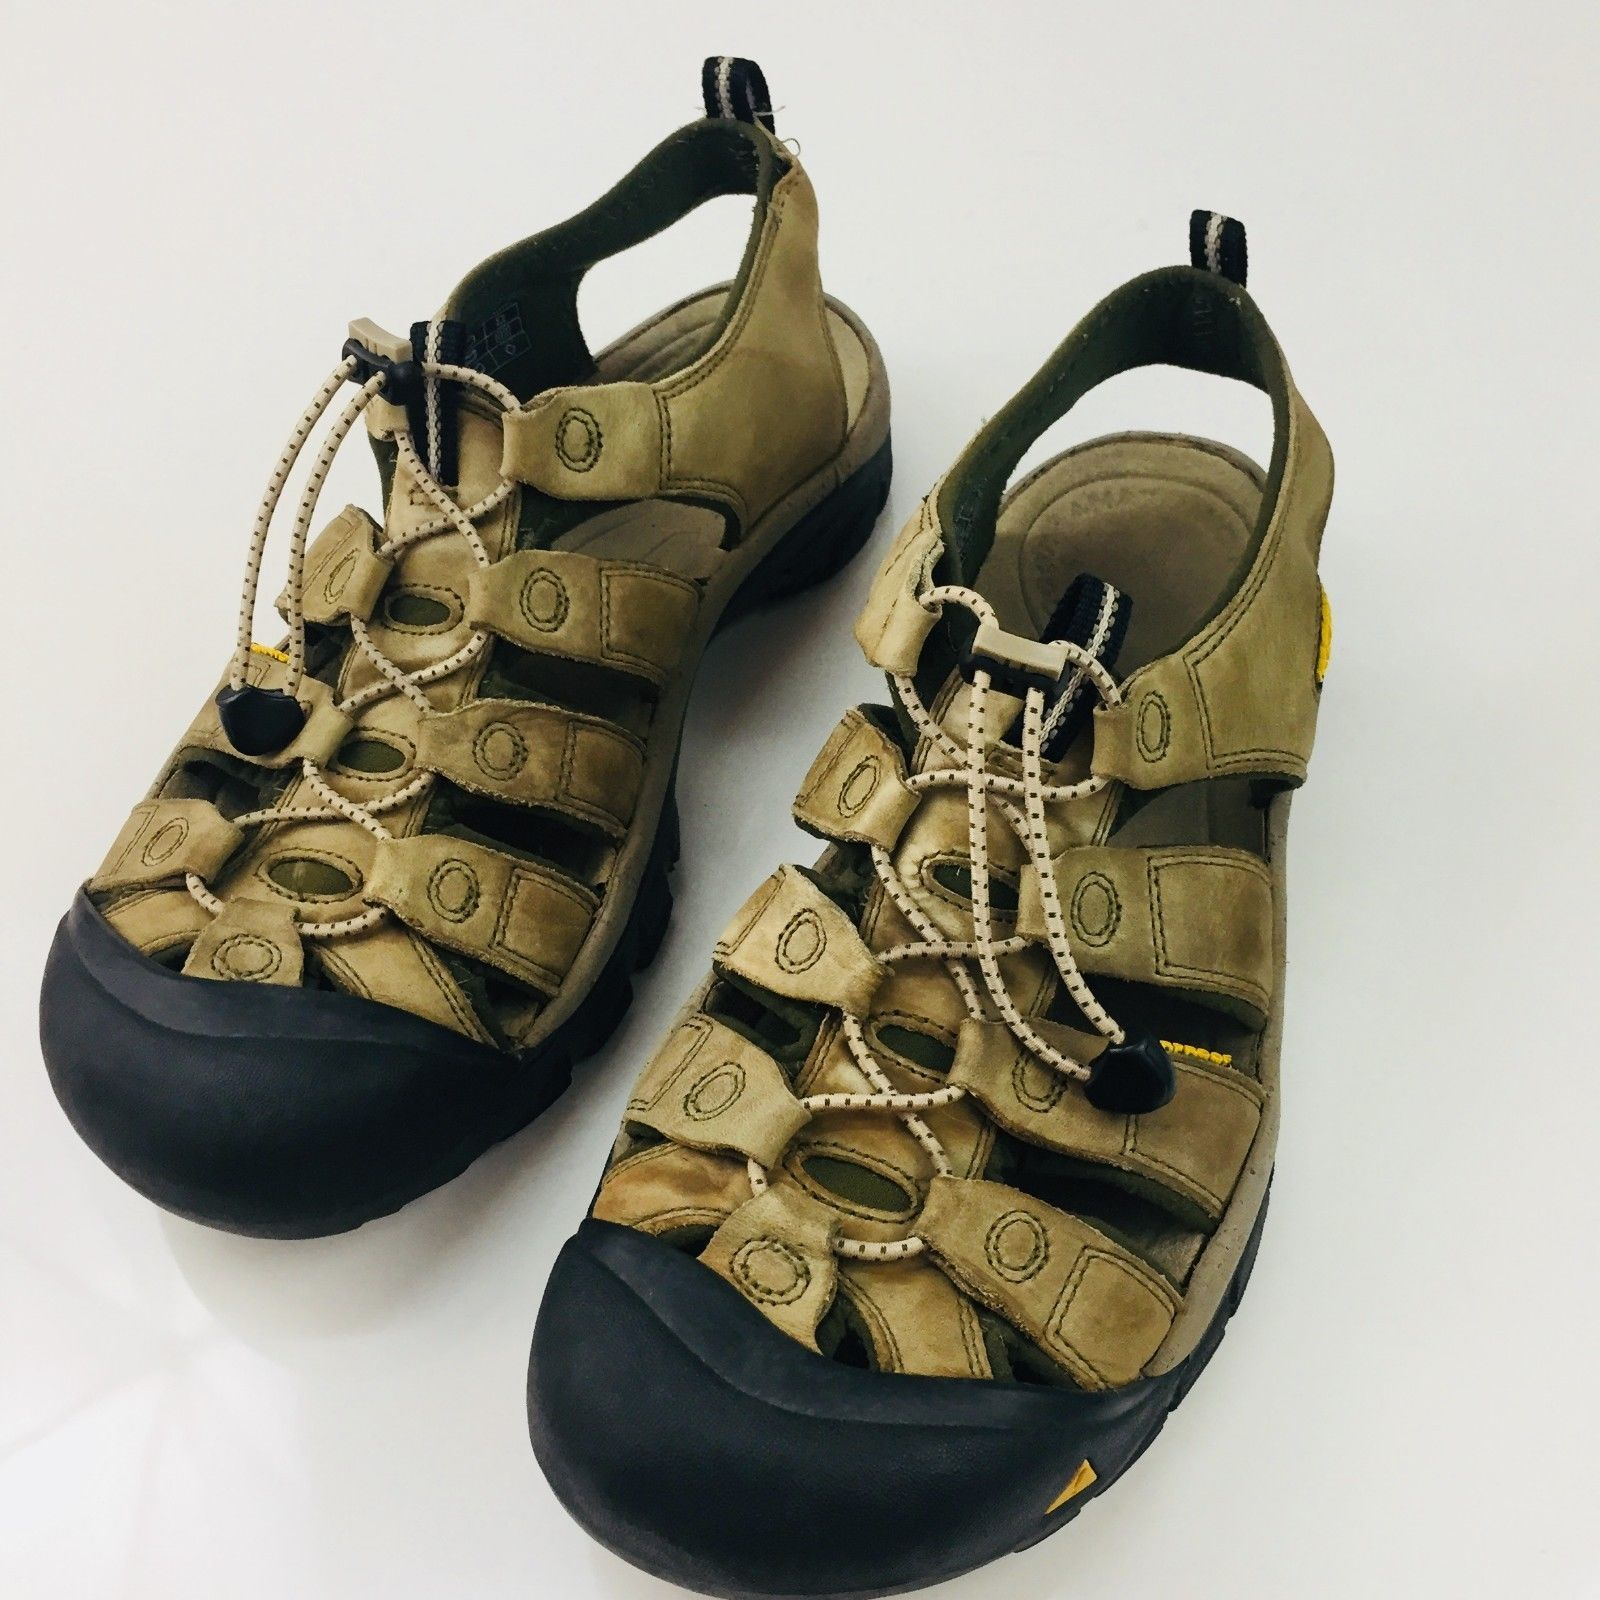 fa31a02071d1 KEEN Mens Newport H2 Hiking Trail Walking Sandals WATERPROOF Shoes US 11.5  EU 45 UK 10.5  keen  keensandals  keenmensandals  KeenHiking